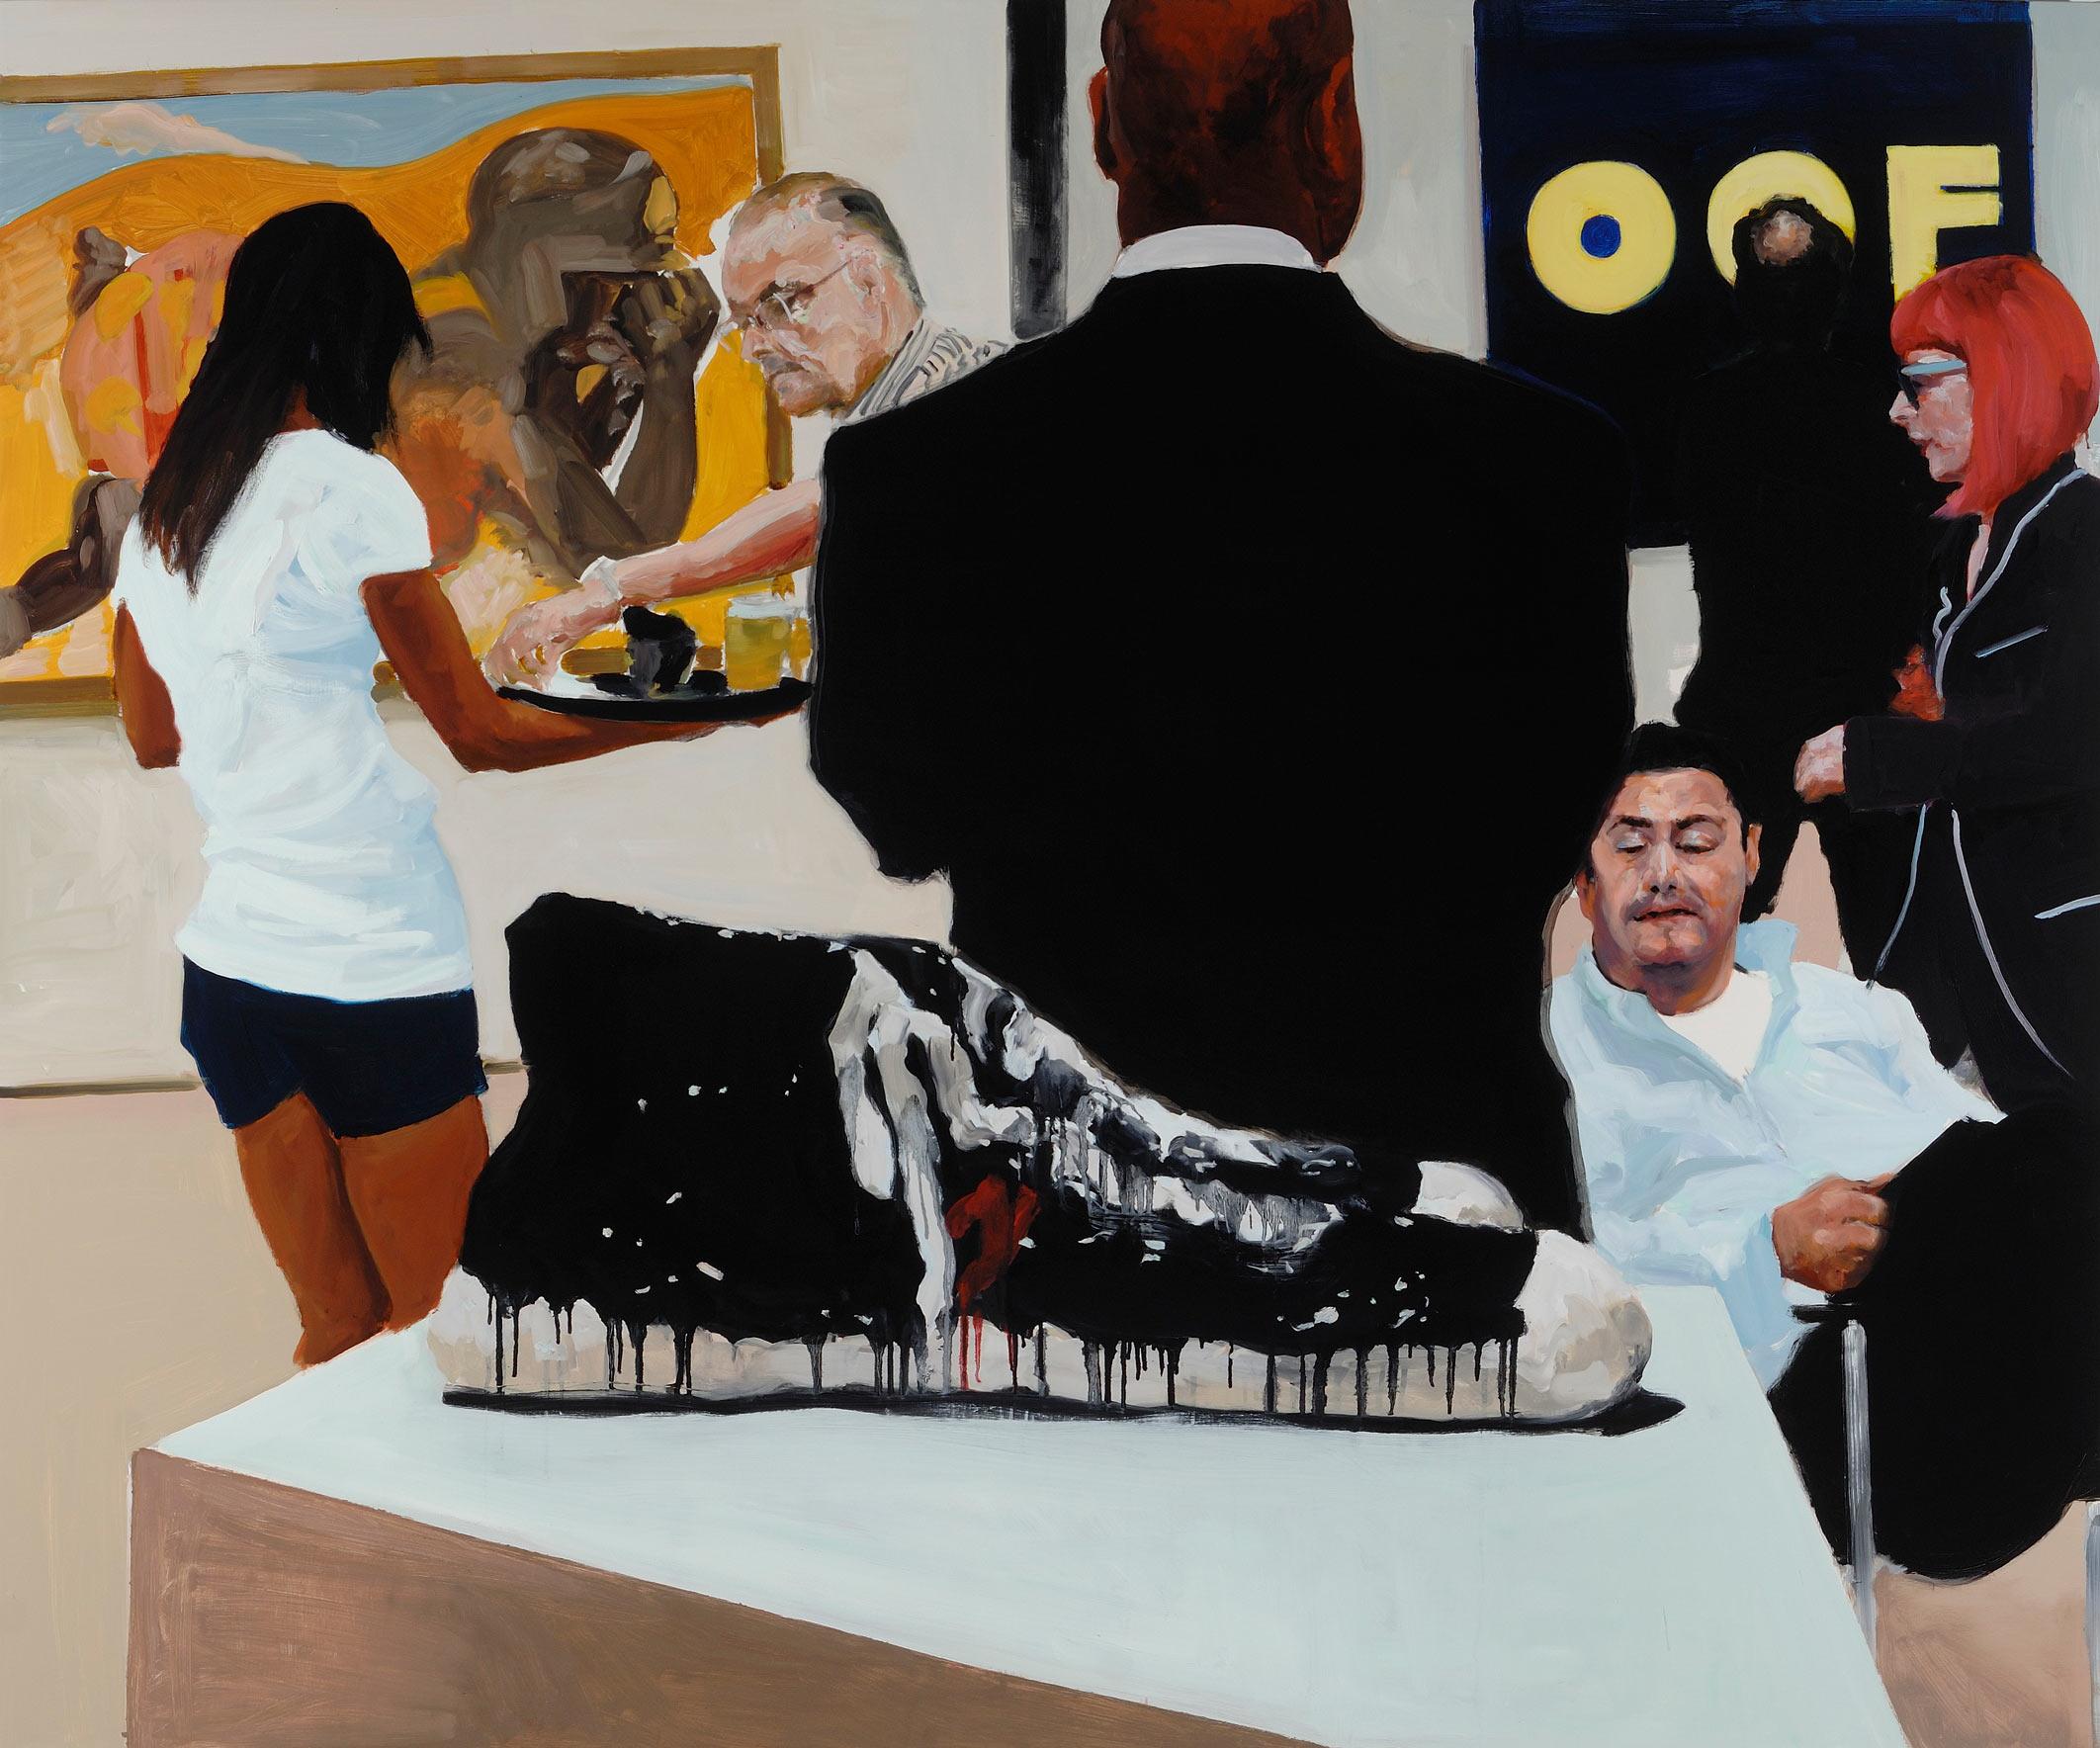 Art Fair: Booth #15  OOF, 2014. Oil on Linen. 68 x 82 in. (173 x 208 cm.)